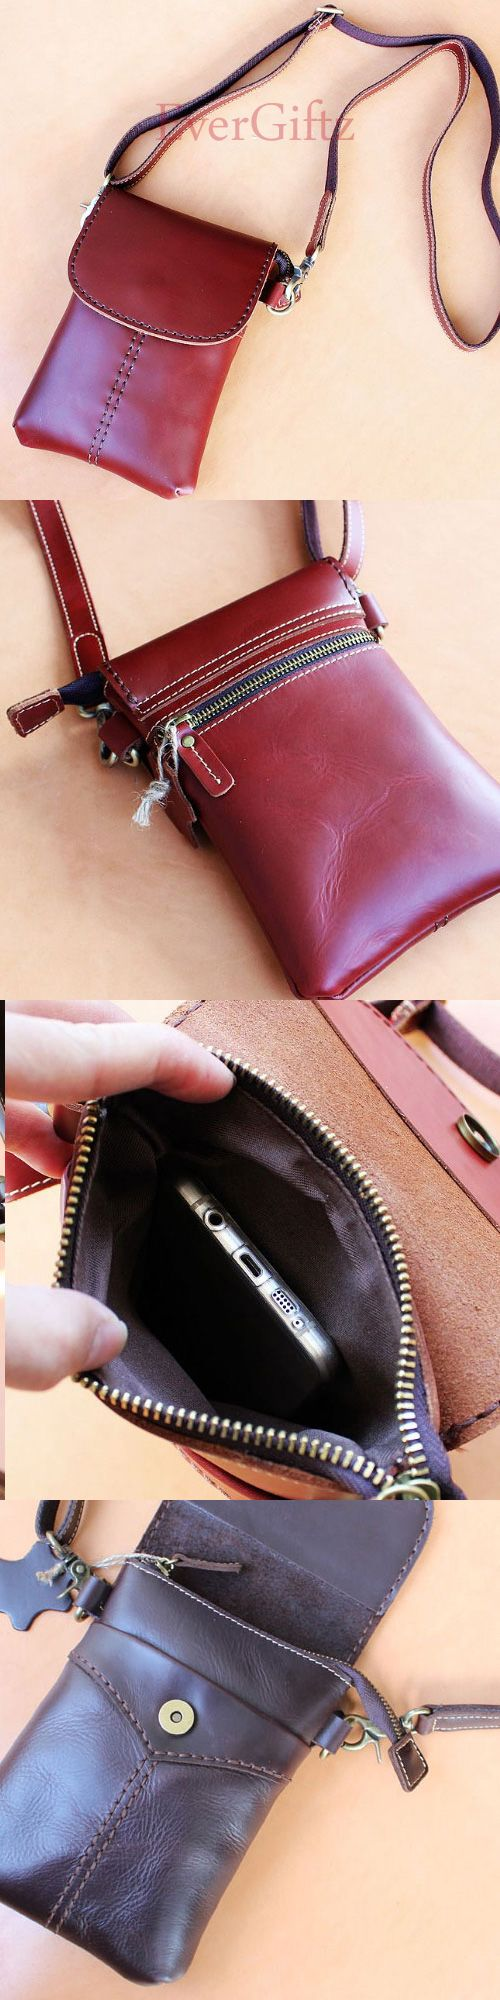 Handmade phone leather vintage women handbag shoulder bag crossbody bag